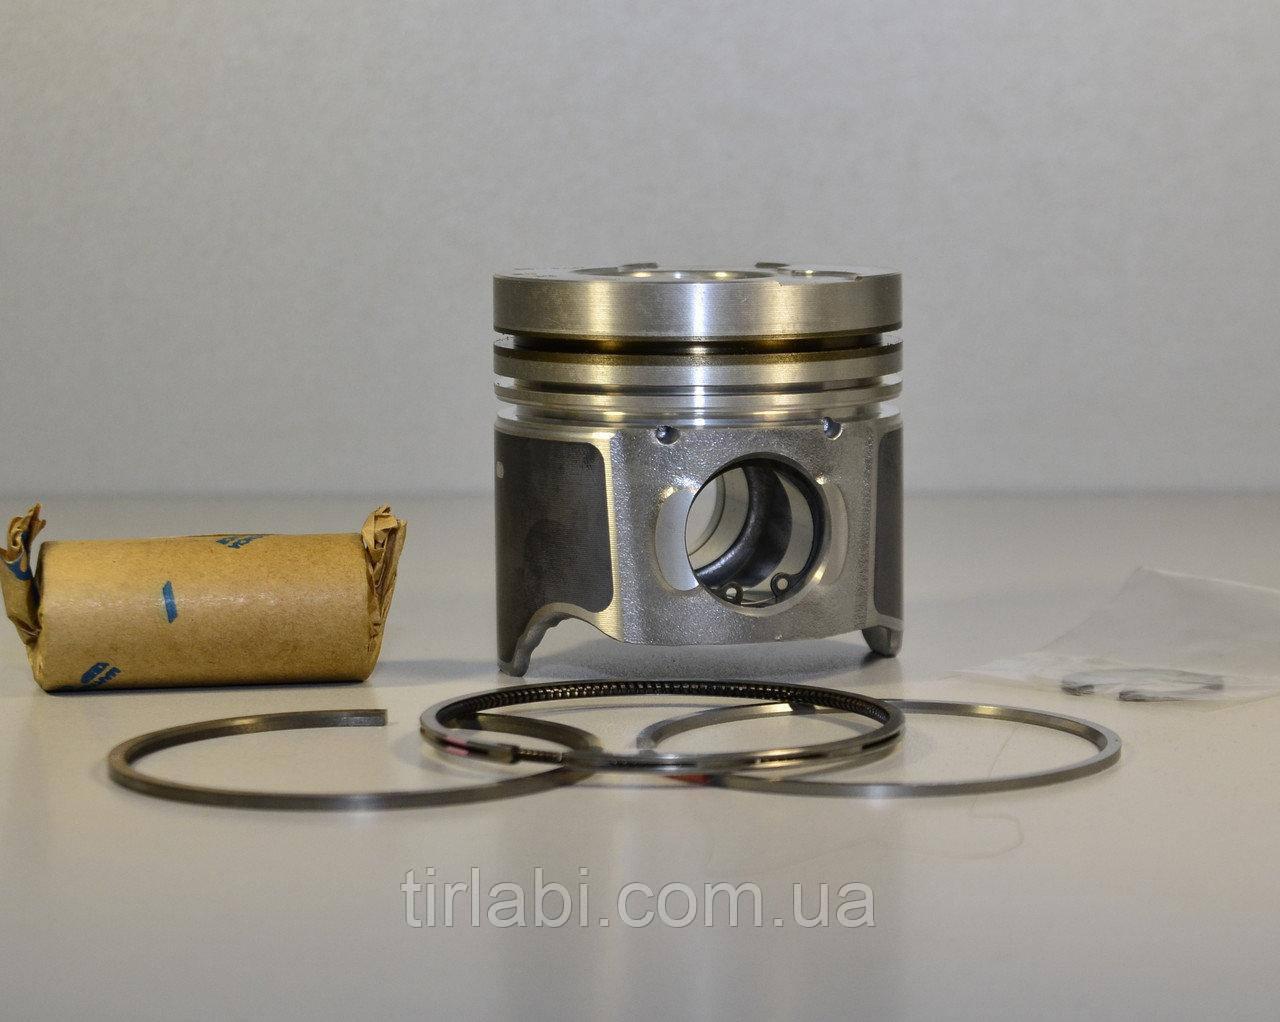 Поршень Renault R.V.I.120.0 R6 MIDR06.20.45